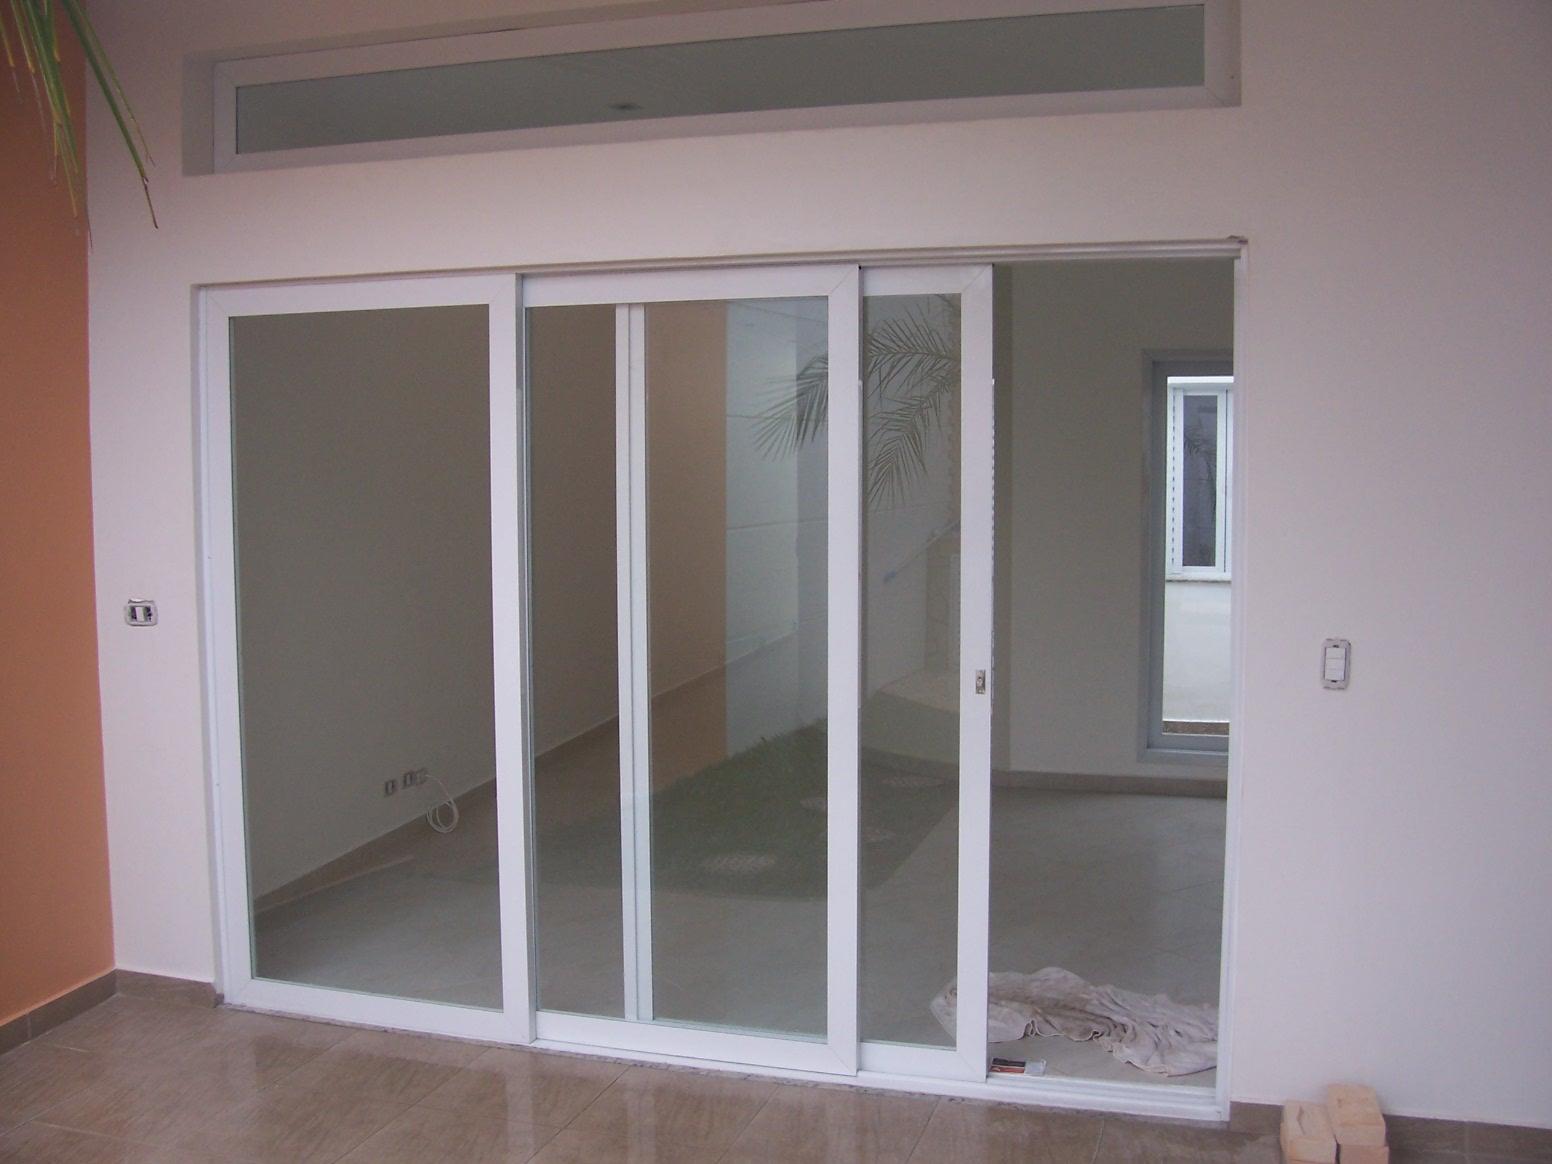 #6F5A51 Infinity: Janelas e Porta 616 Janelas Esquadrias De Aluminio Curitiba